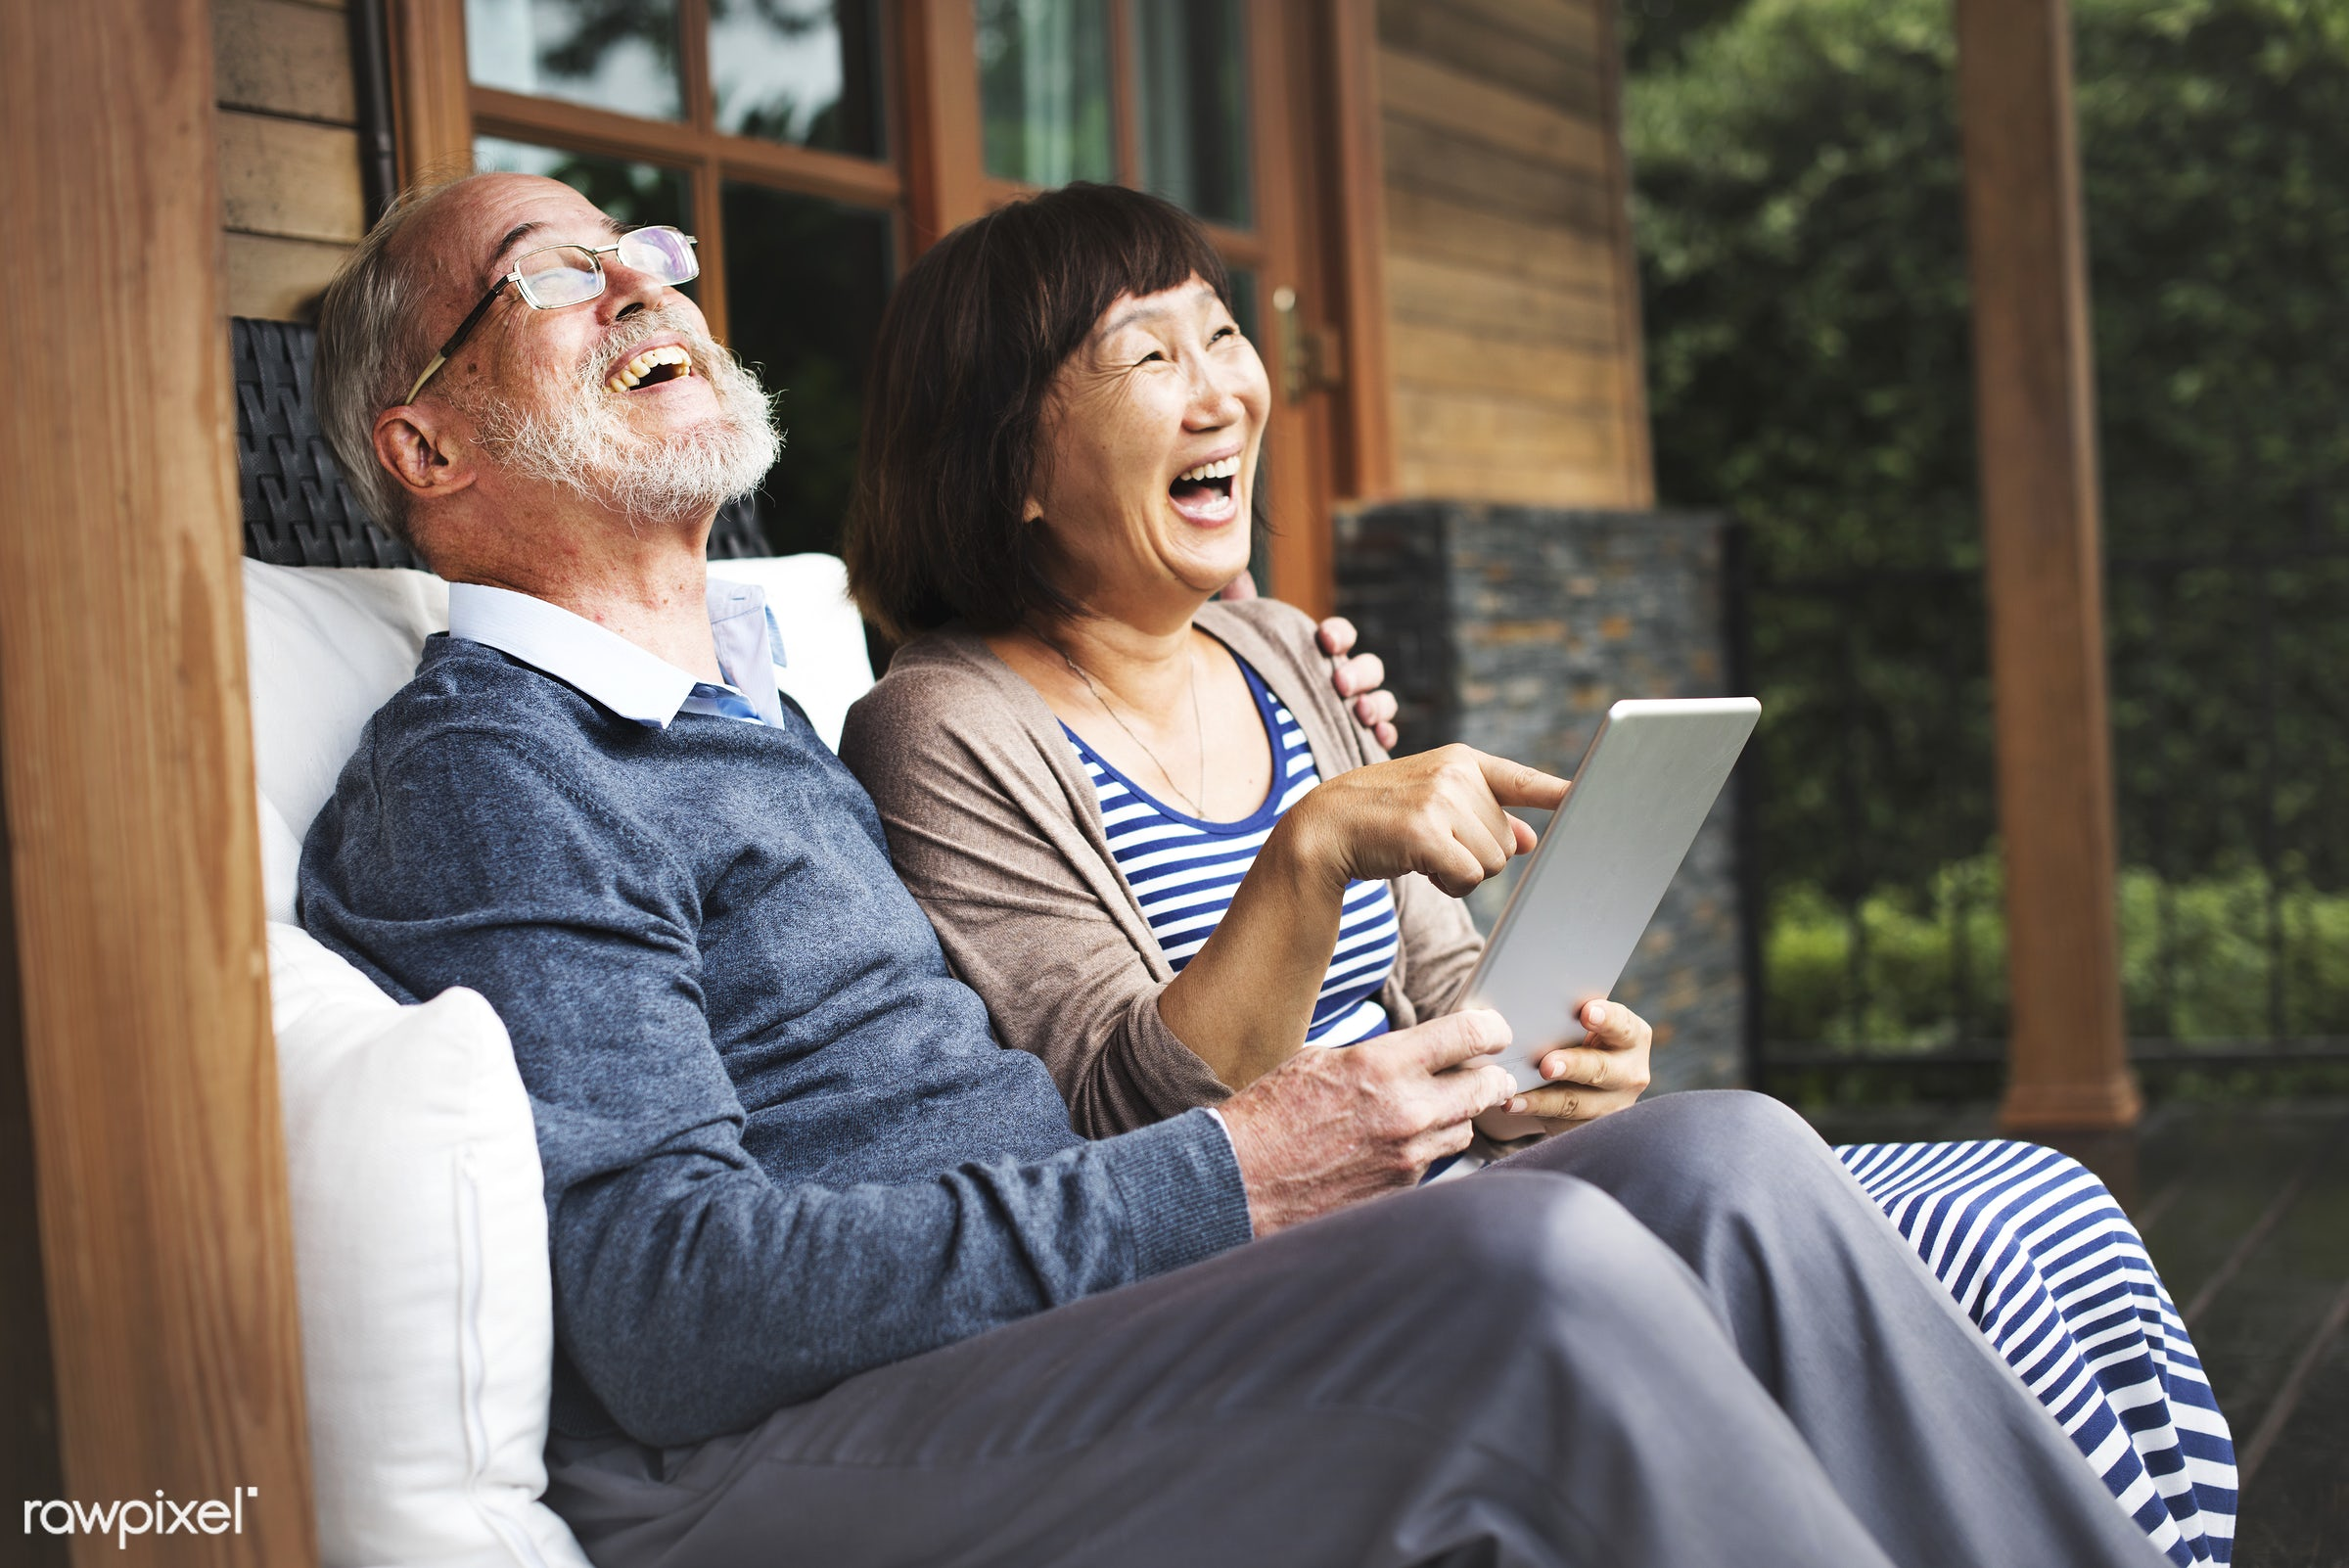 adult, asian ethnicity, bonding, caucasian, chair, cheerful, couple, dating, device, digital, door, female, garden,...